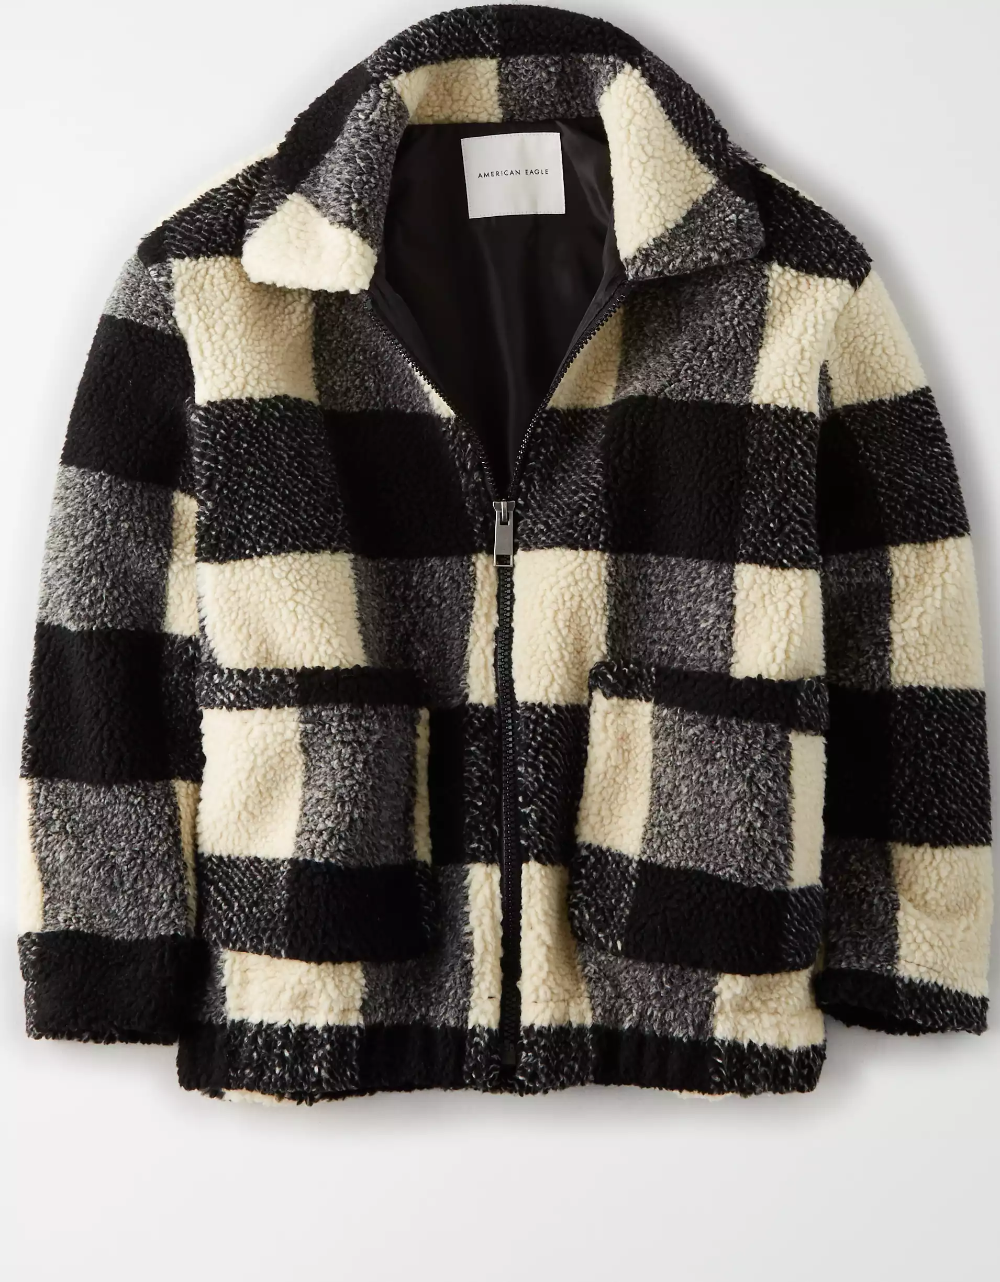 Ae Fuzzy Sherpa Bomber Jacket Clothes Bomber Jacket Jackets [ 1282 x 1000 Pixel ]